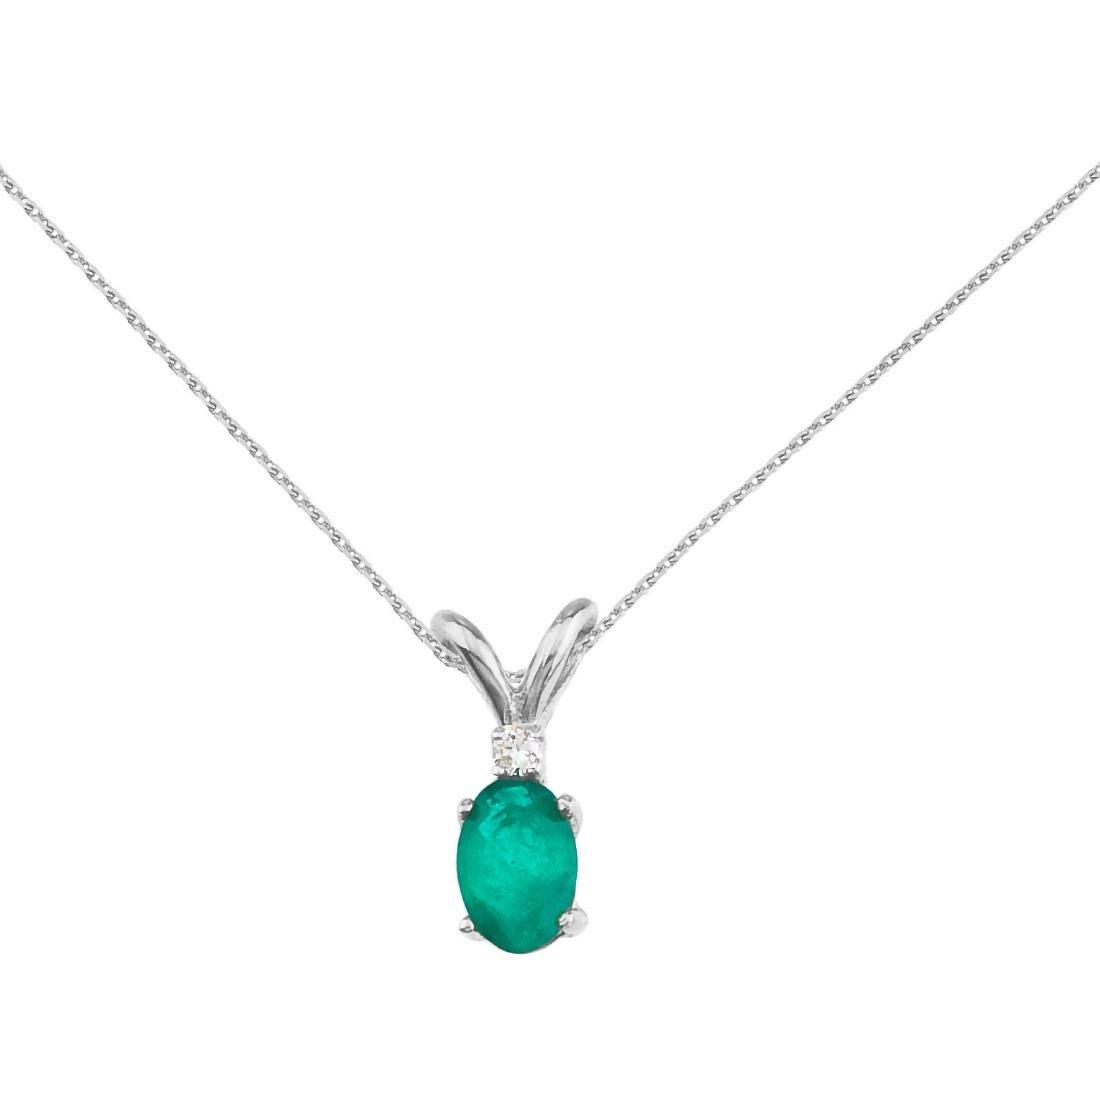 Certified 14k White Gold Emerald and Diamond Oval Penda